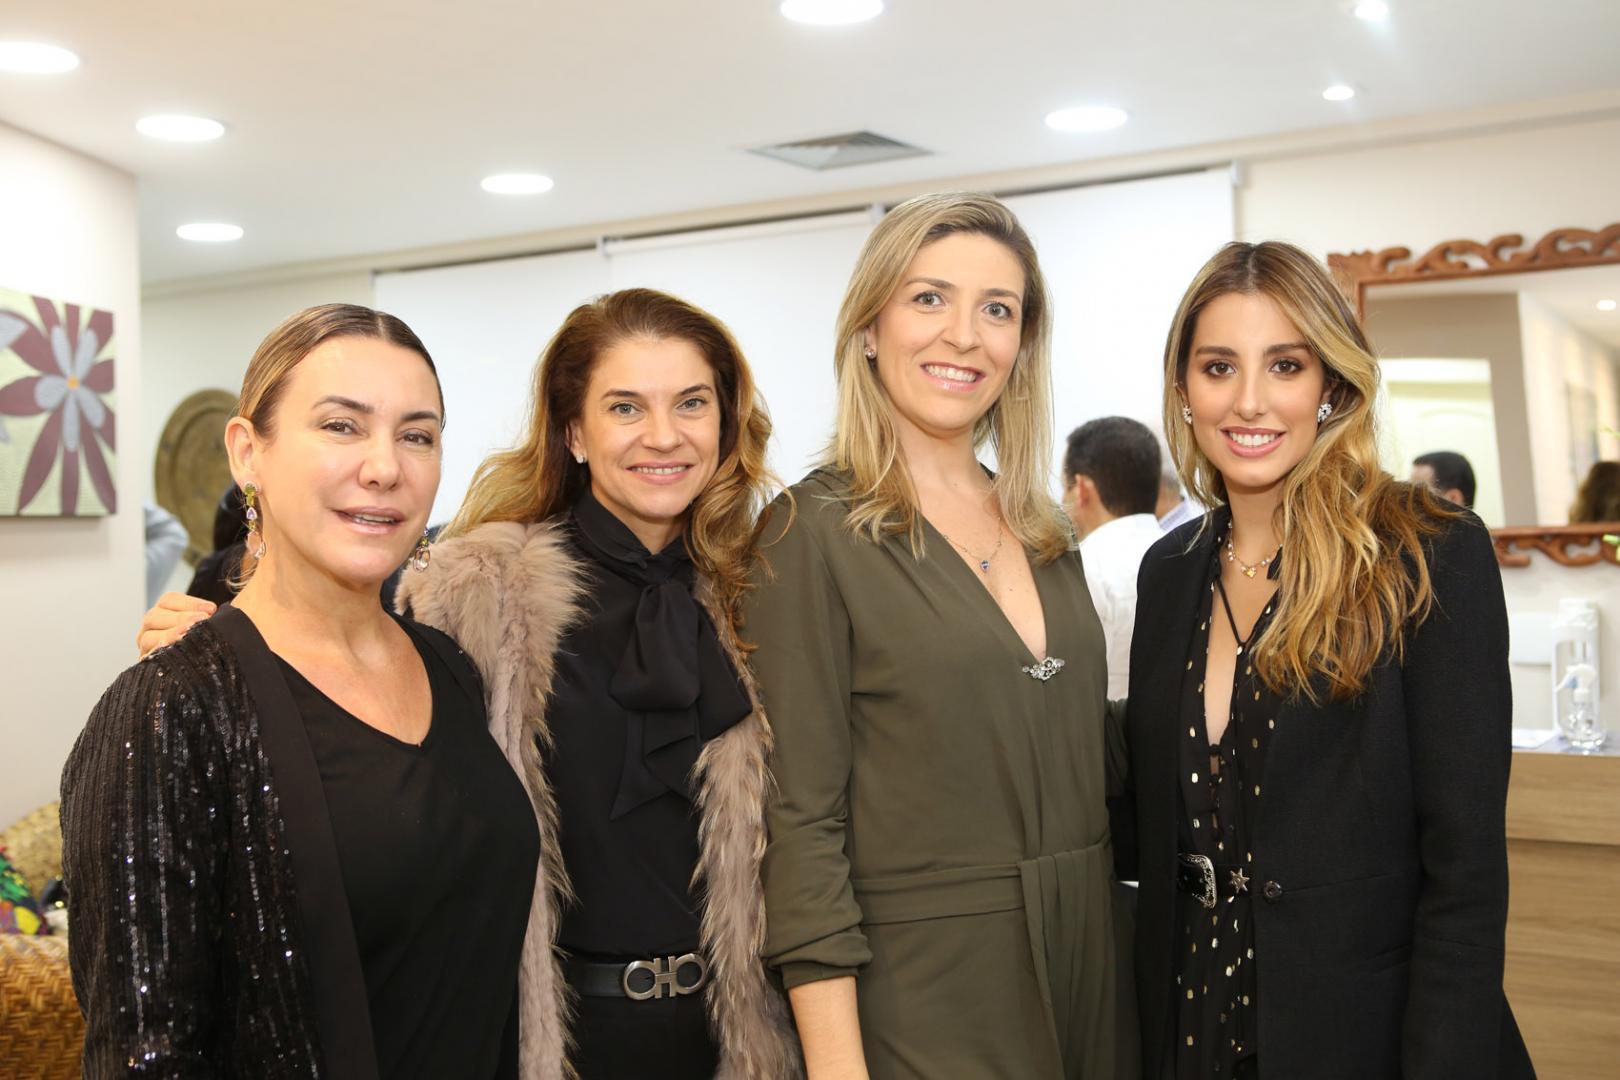 Danielle Stabile inaugura clínica de estética na Barra